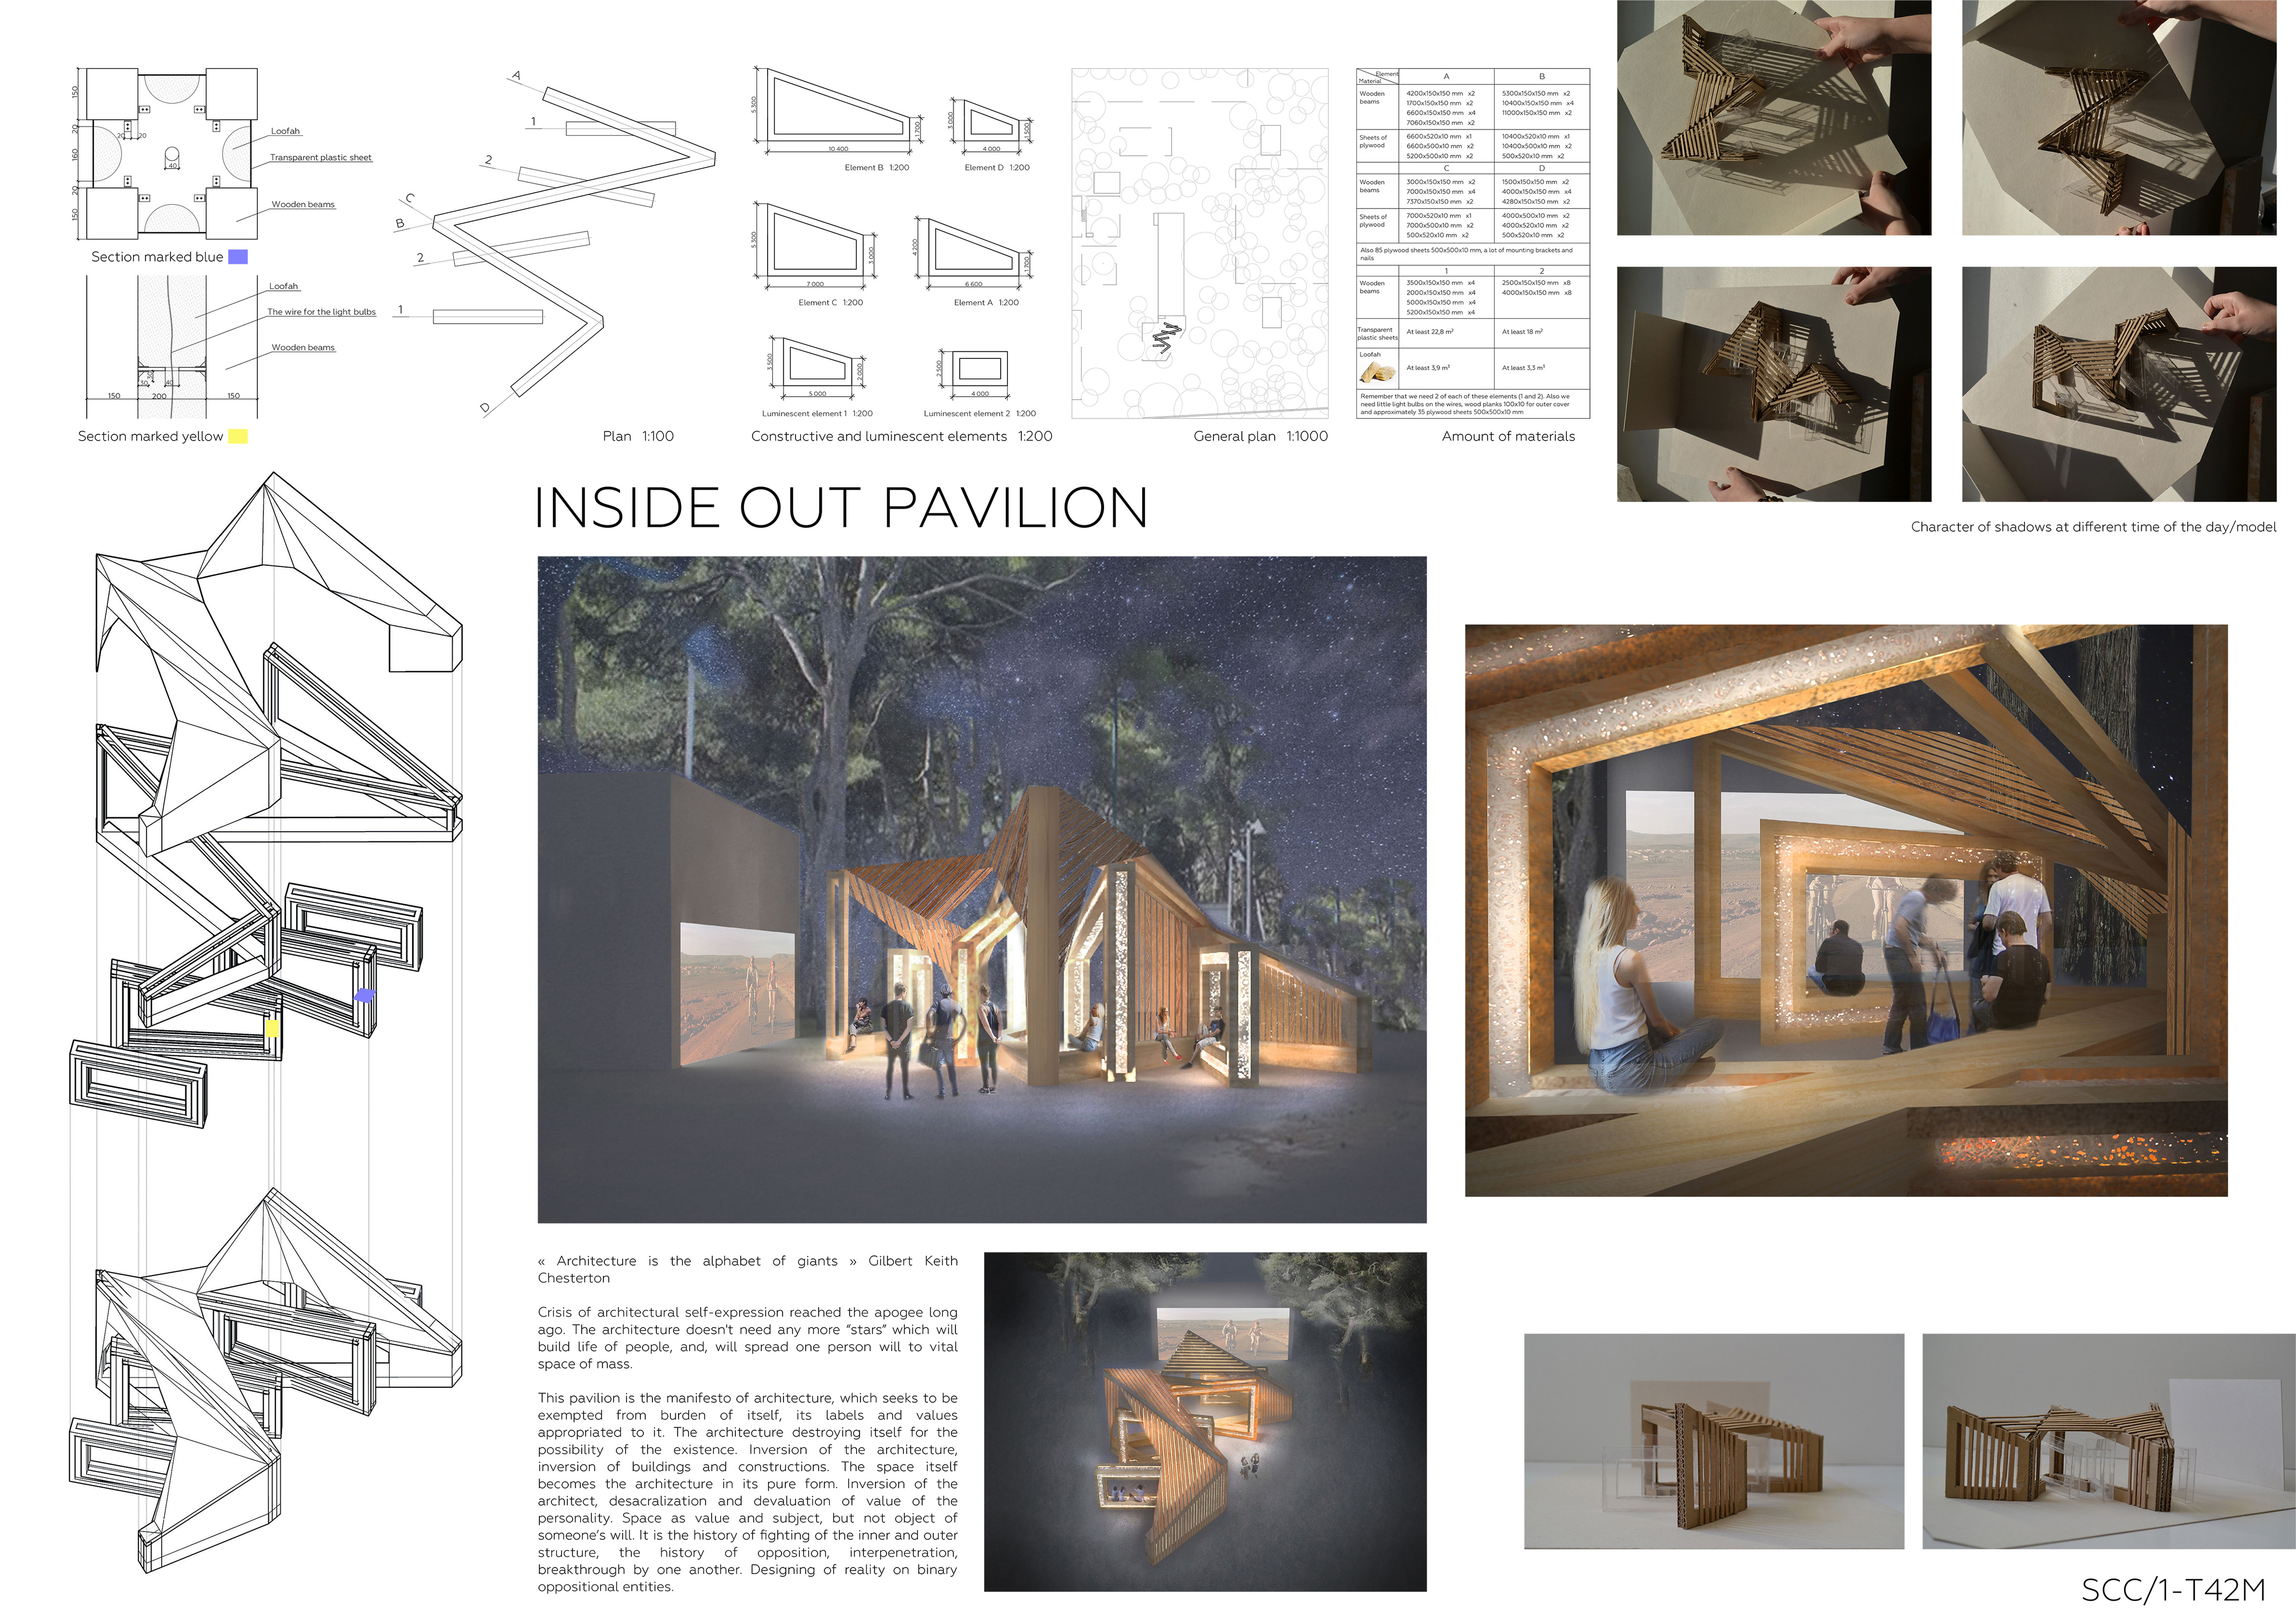 inside out pavilion Board